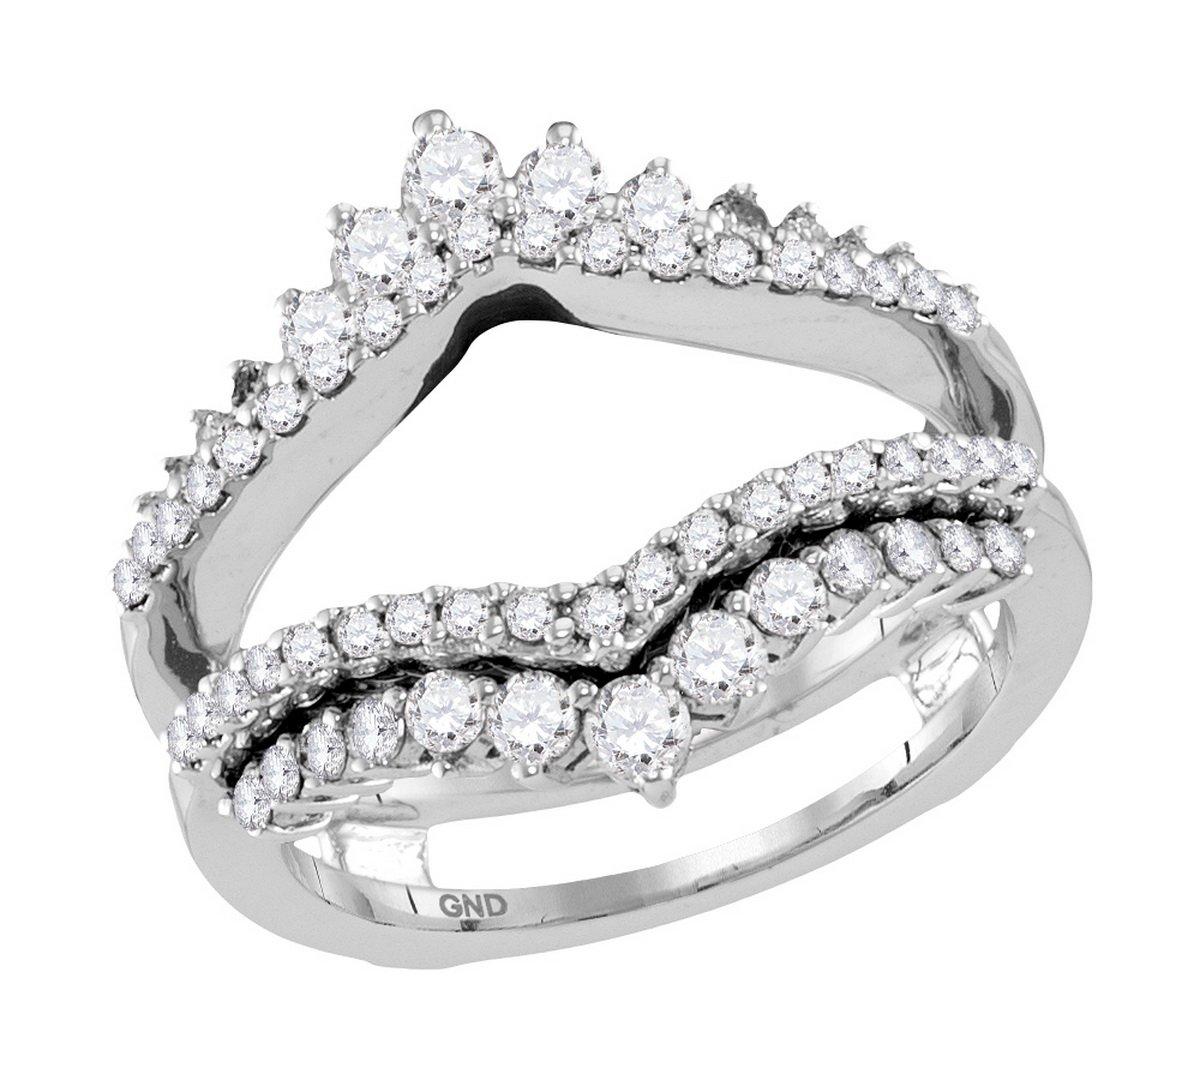 14kt White Gold Womens Round Diamond Wrap Ring Guard Enhancer Wedding Band 1.00 Cttw (I1-I2 clarity; H-I color)